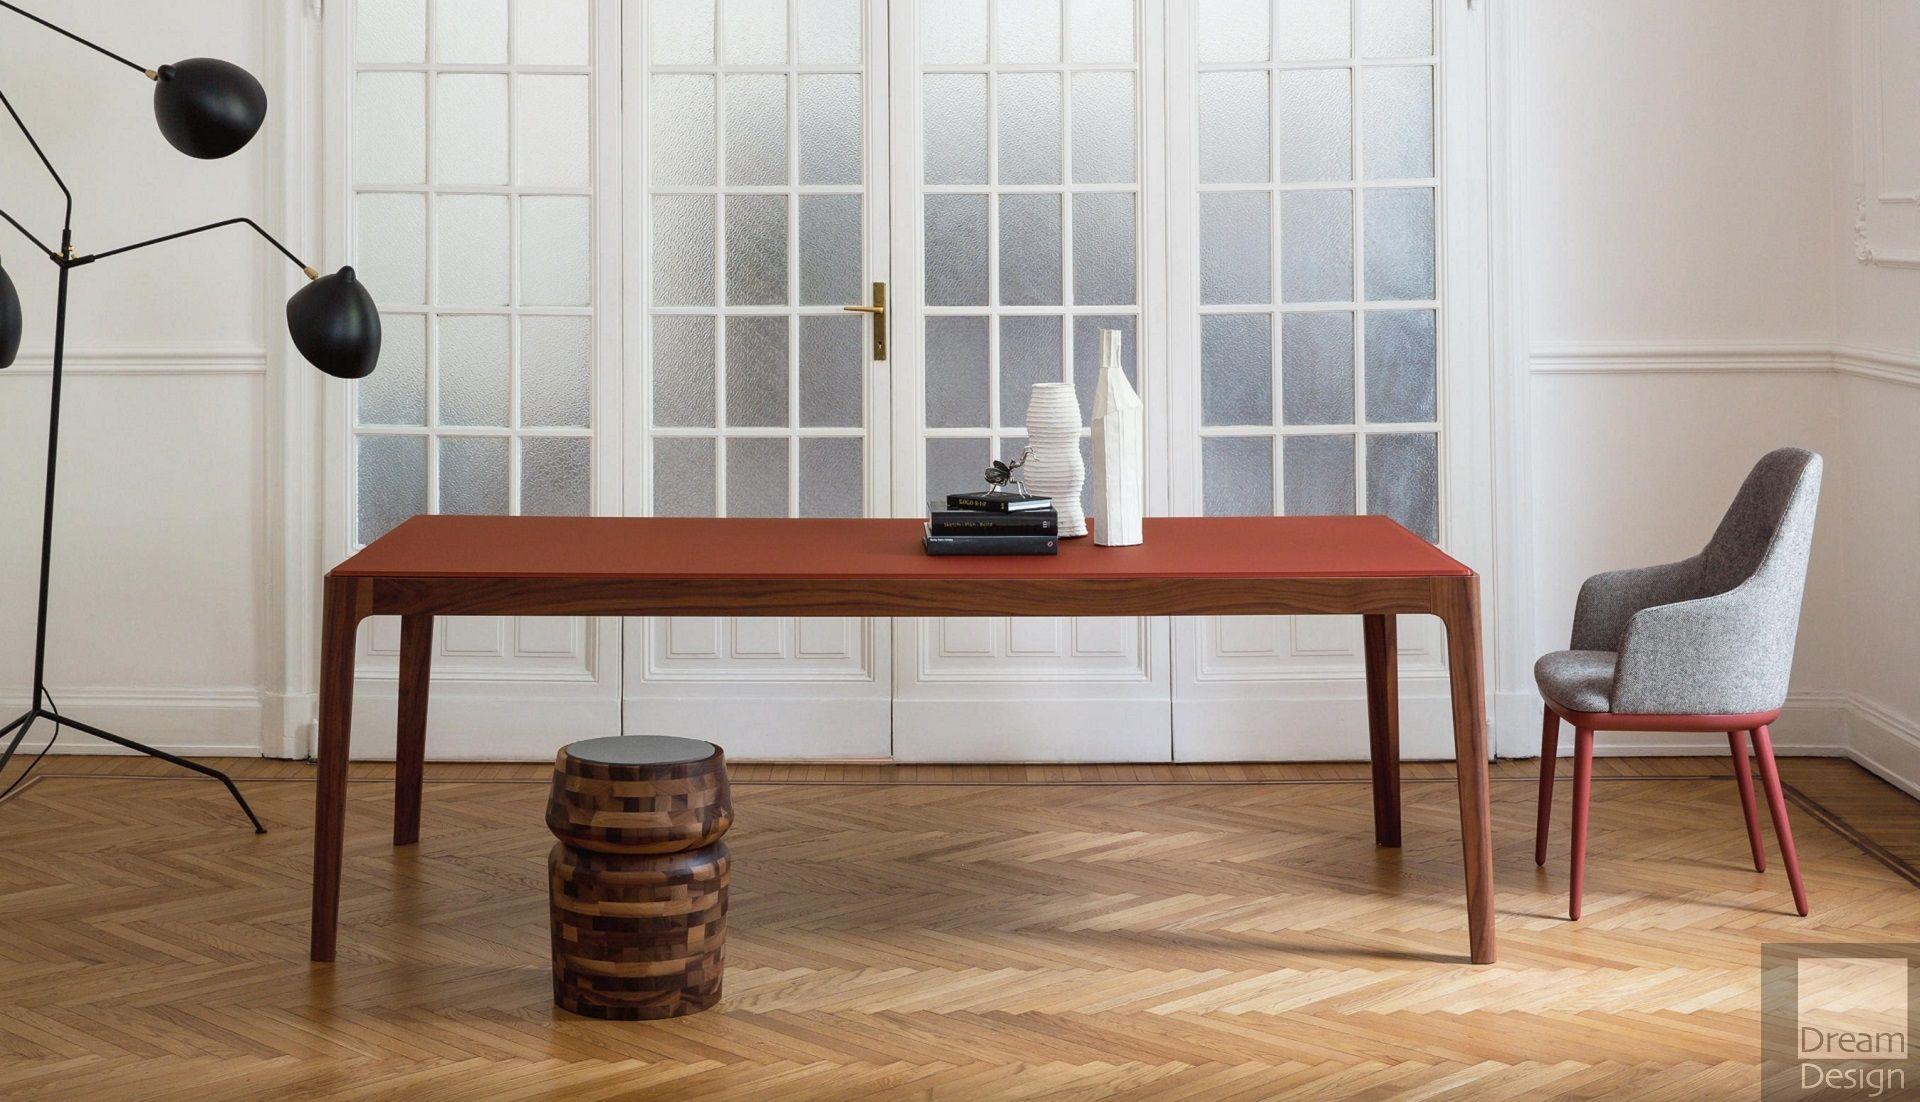 Prime Porada Ziggy Rectangular Table Everything But Ordinary Download Free Architecture Designs Scobabritishbridgeorg